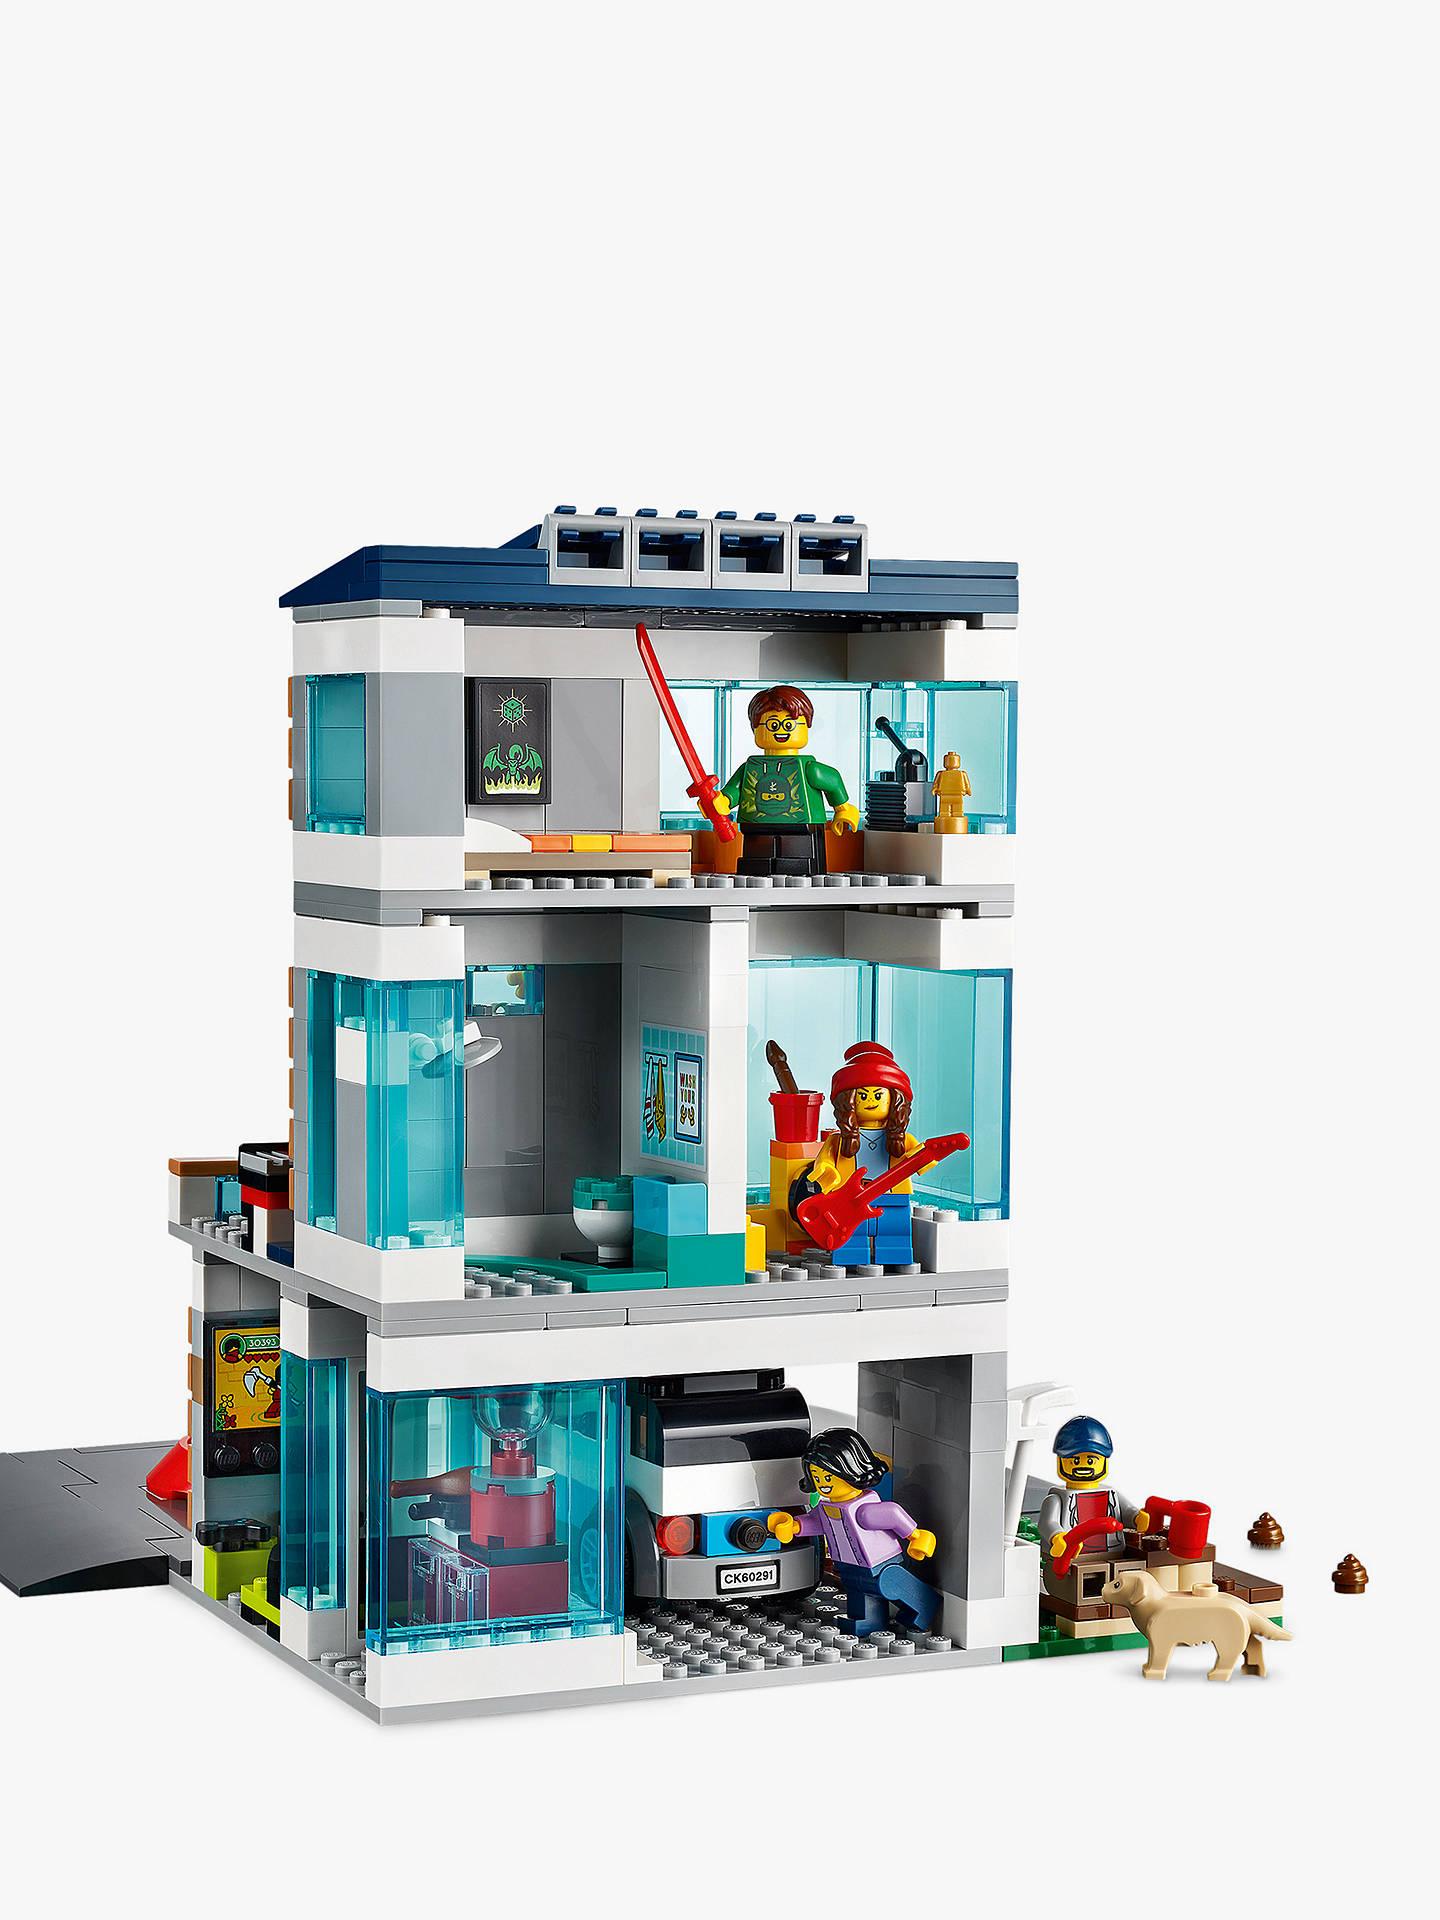 LEGO City 60291 Family House at John Lewis & Partners